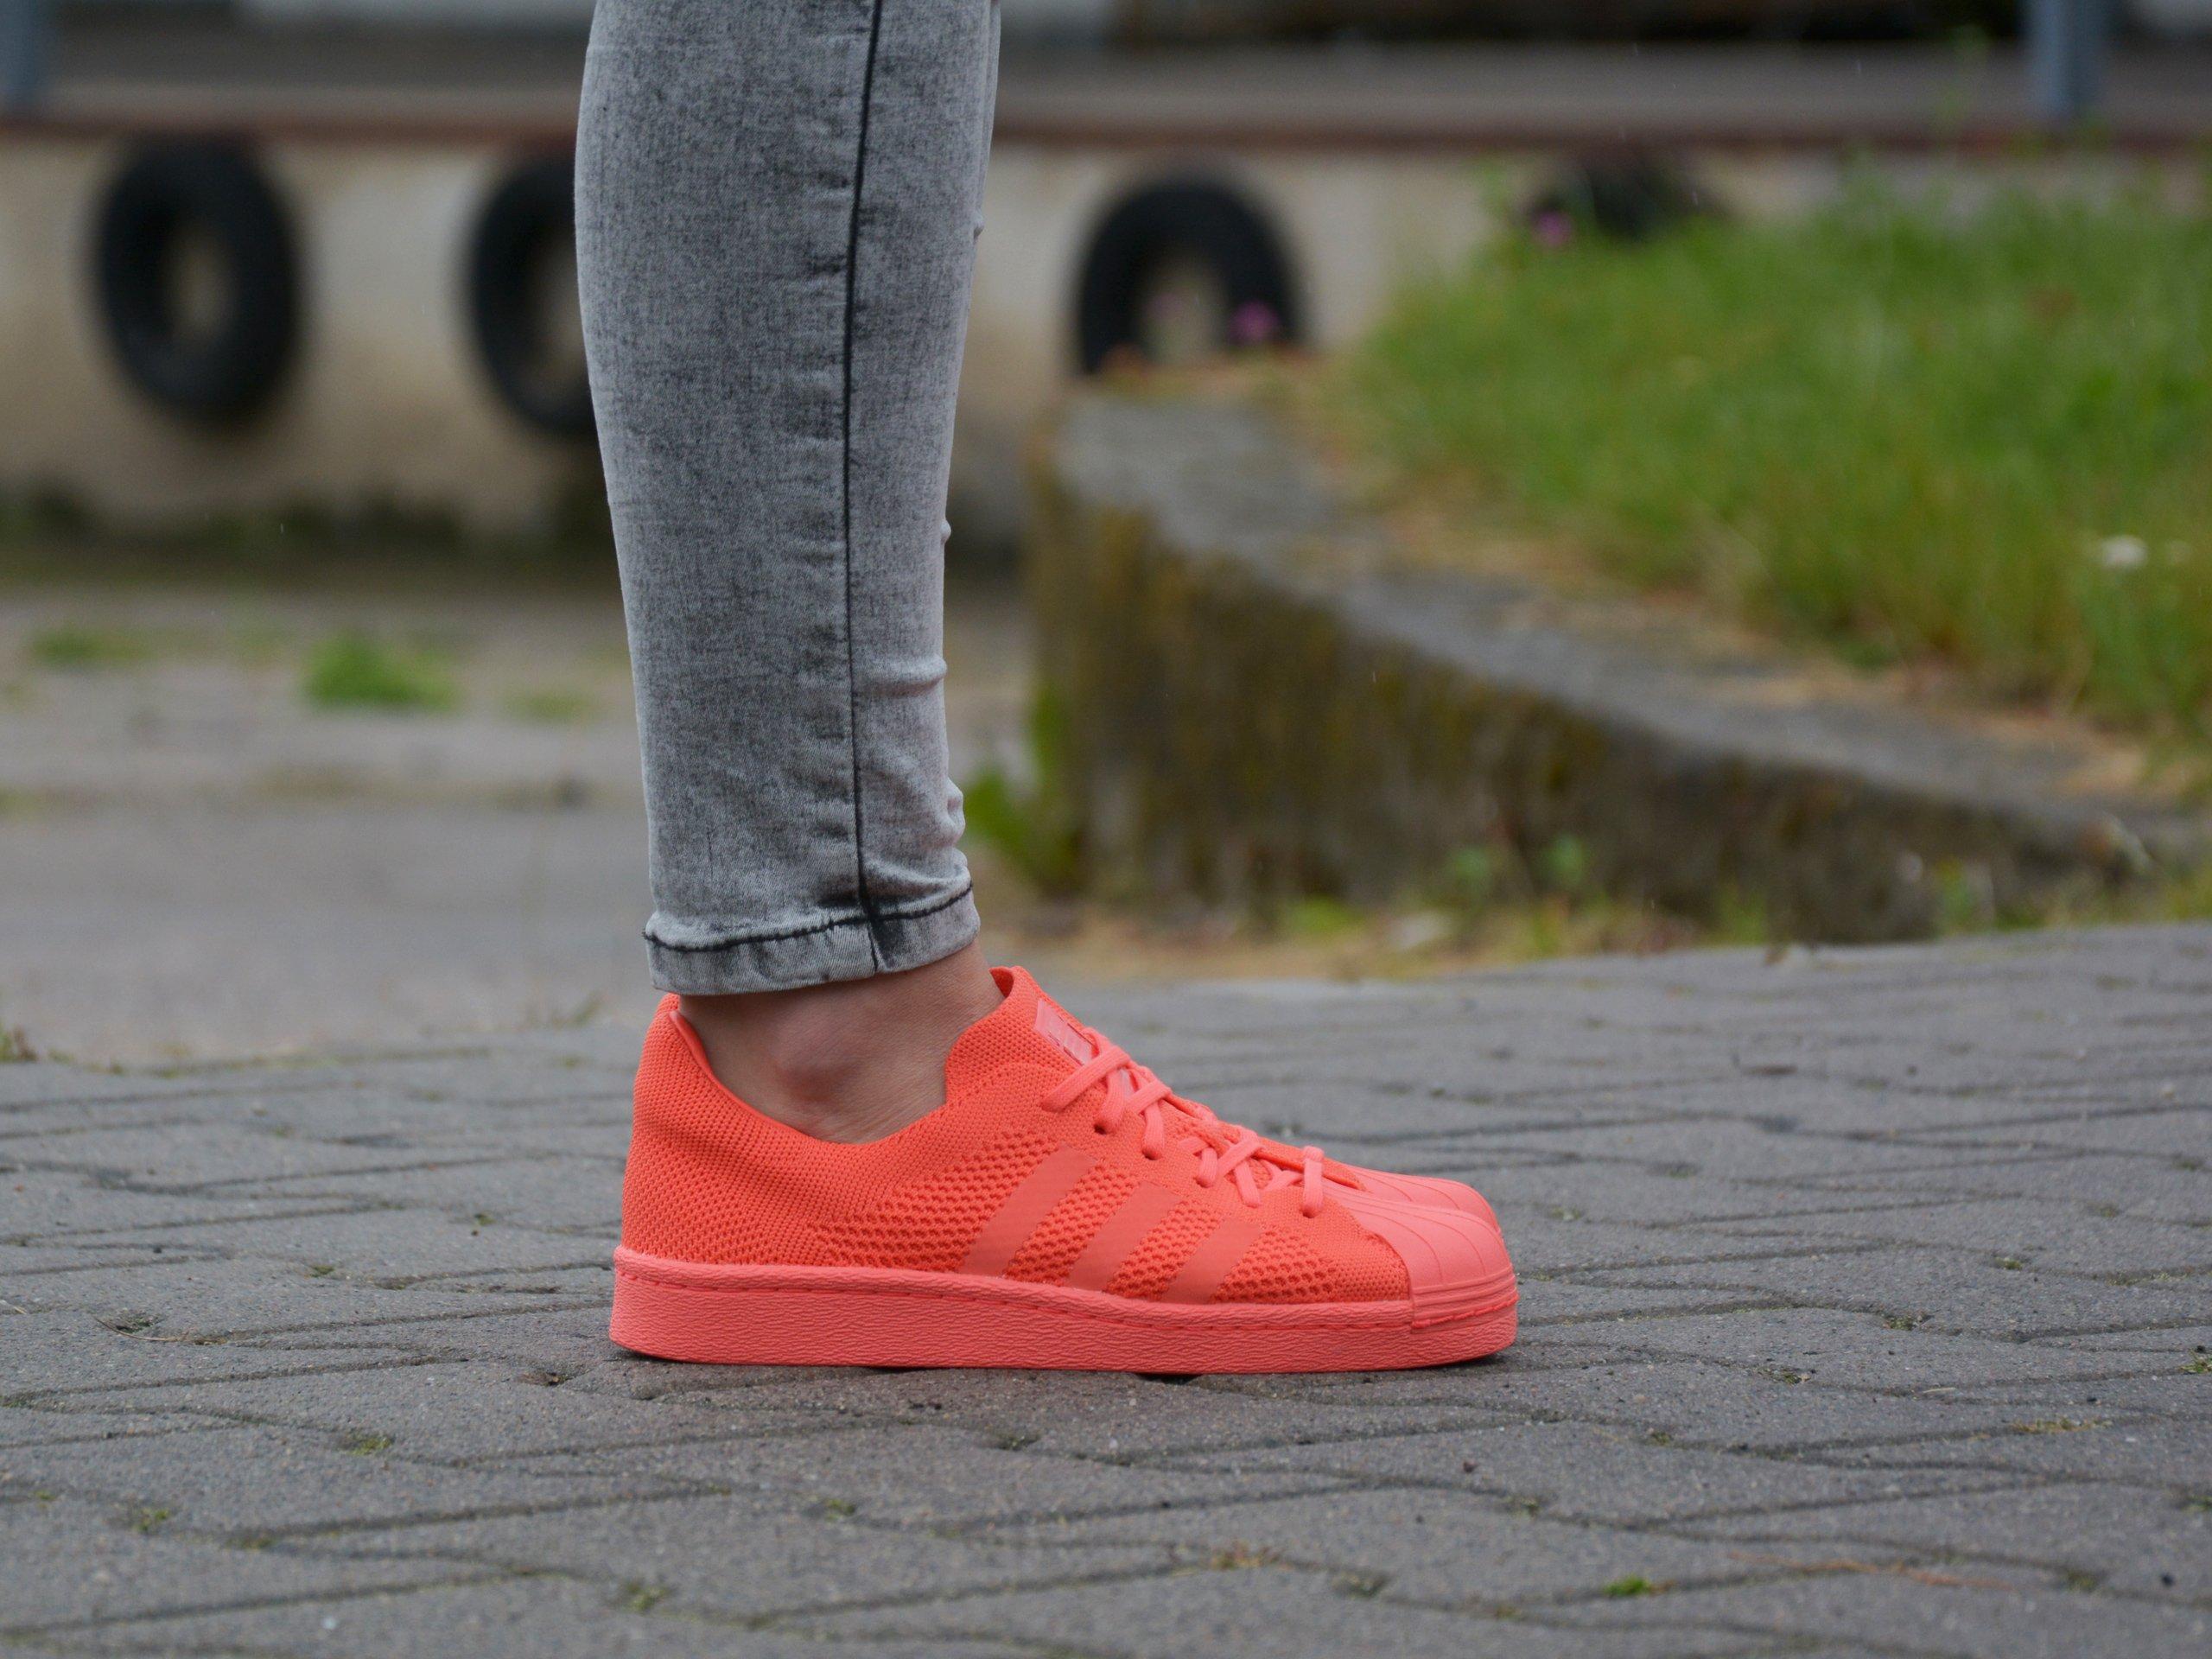 Adidas Superstar Boost Primeknit